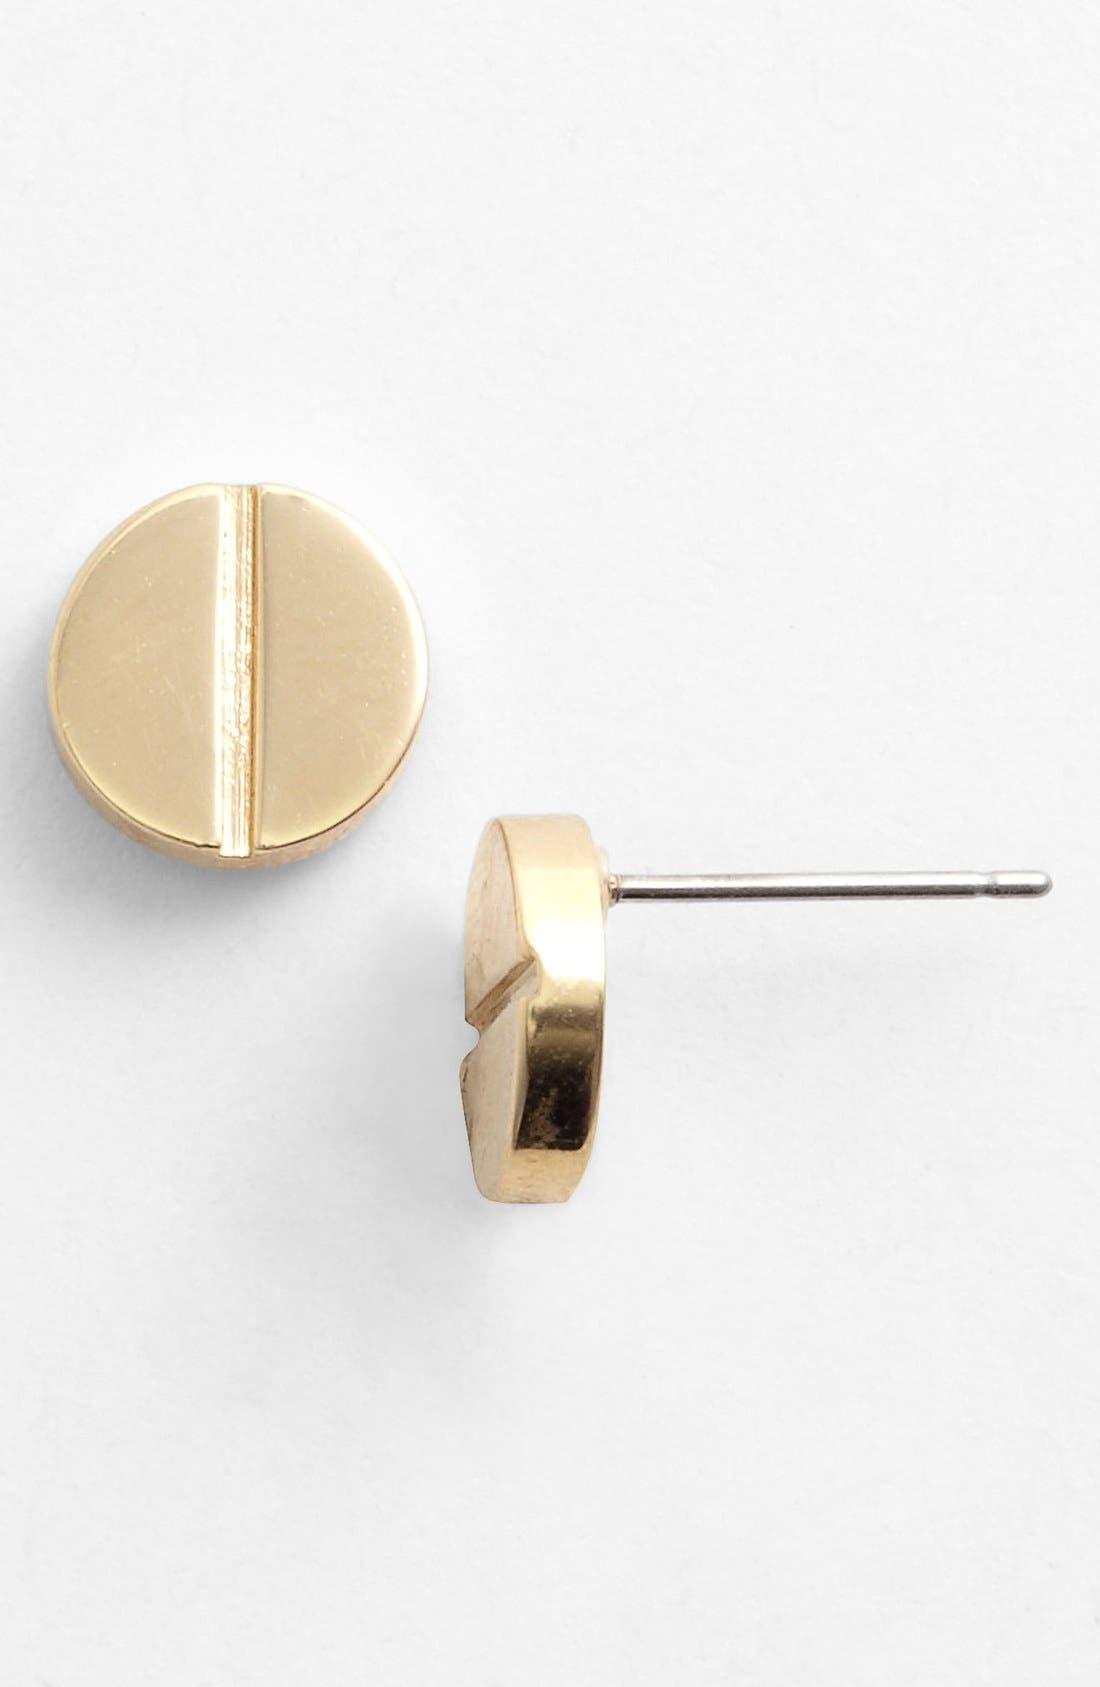 Alternate Image 1 Selected - Tory Burch Screw Rivet Stud Earrings